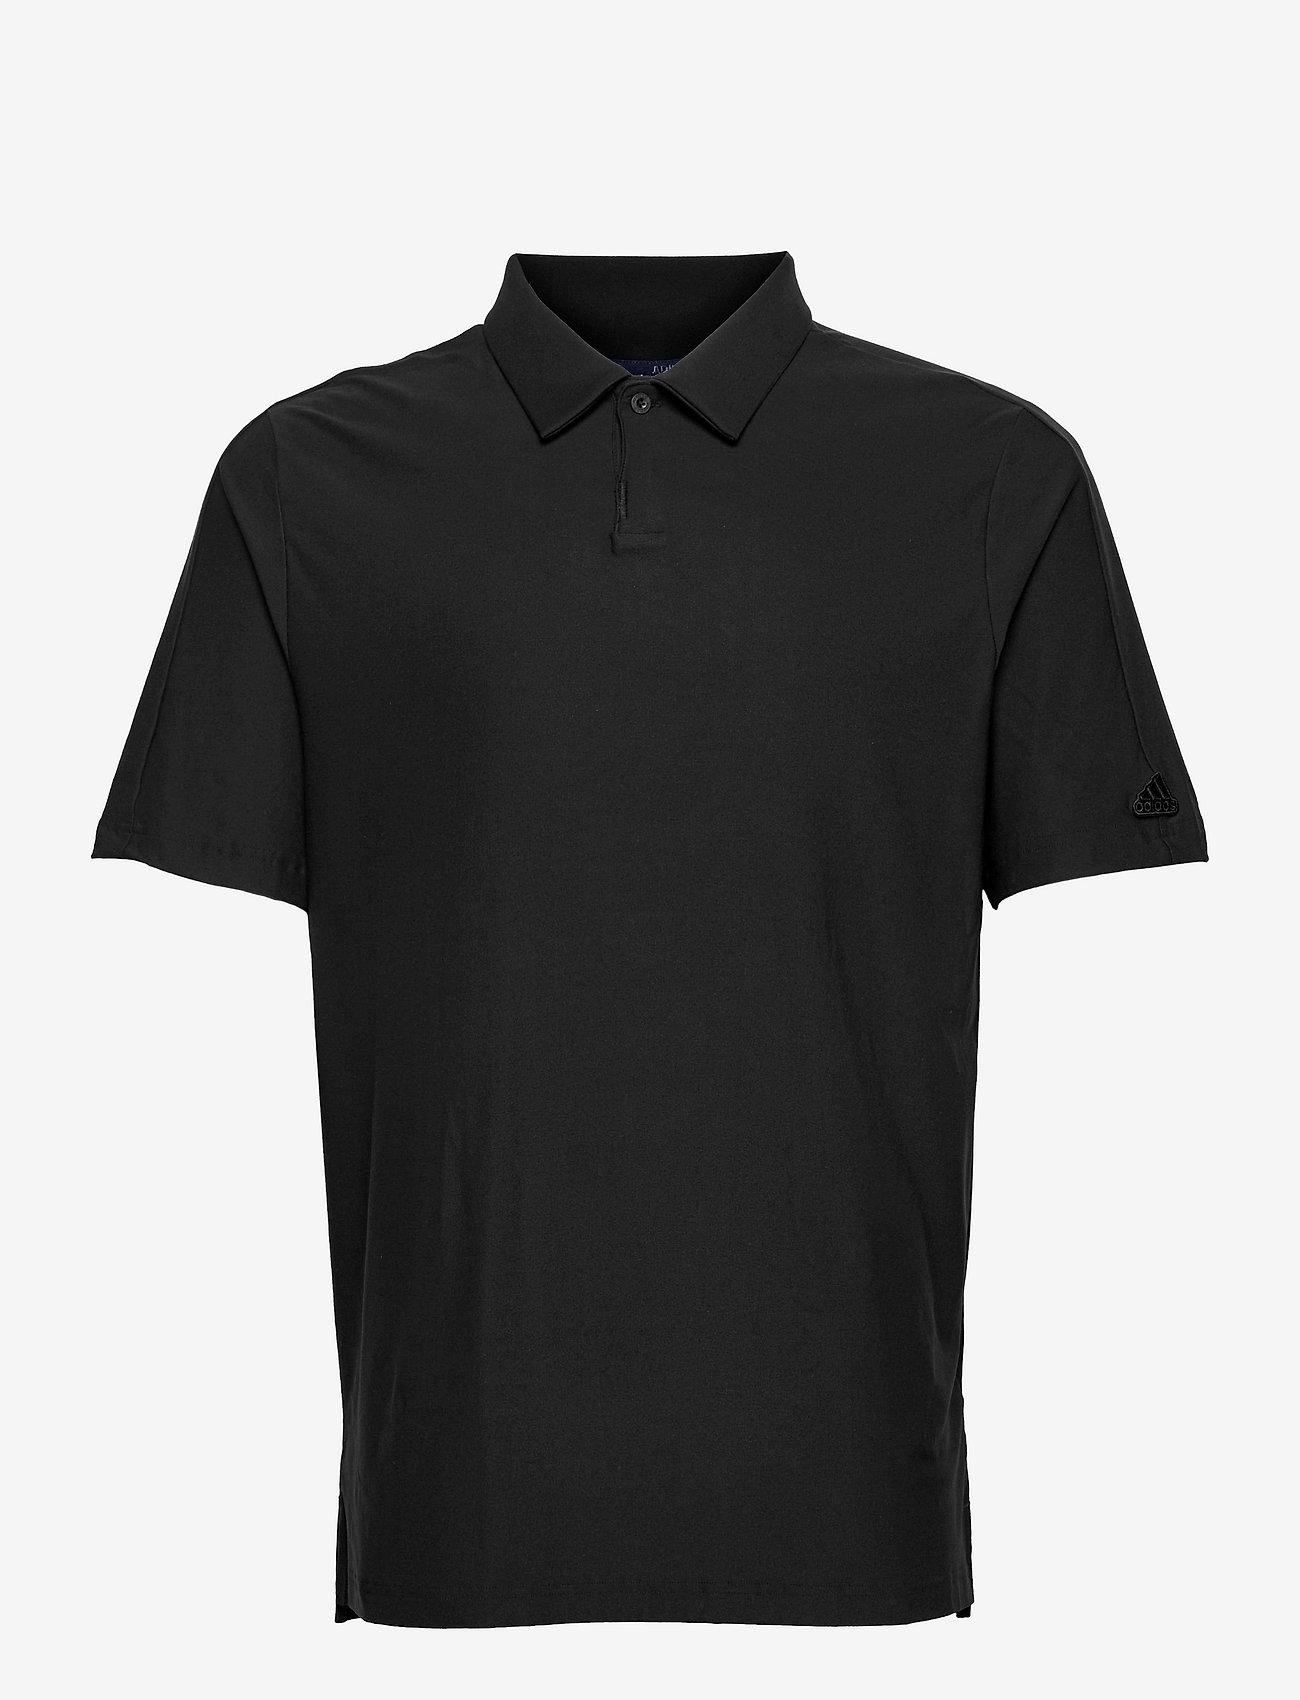 adidas Golf - GO-TO POLO - polos à manches courtes - black - 0